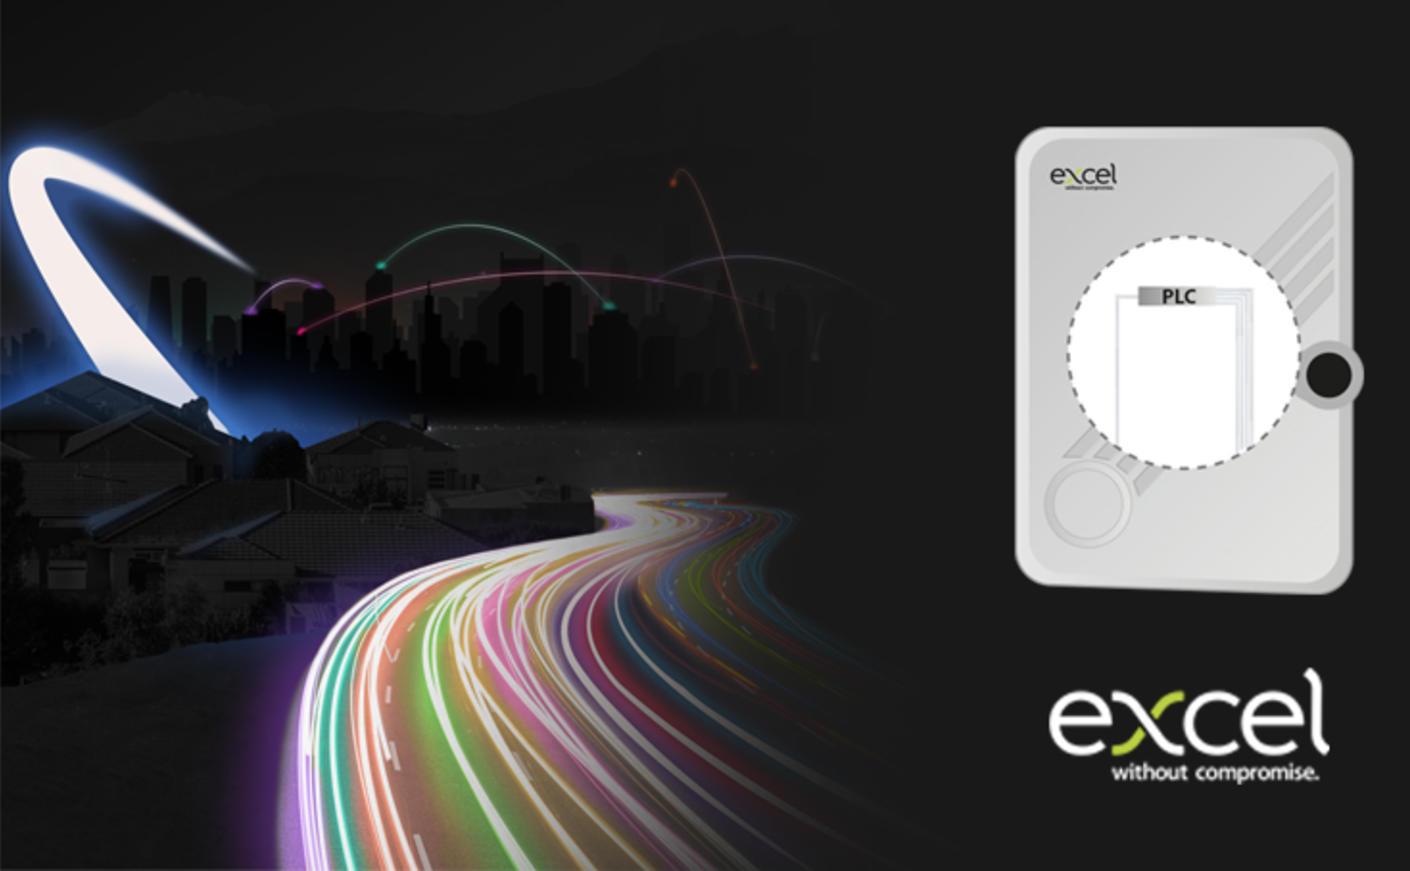 Excel PLCs